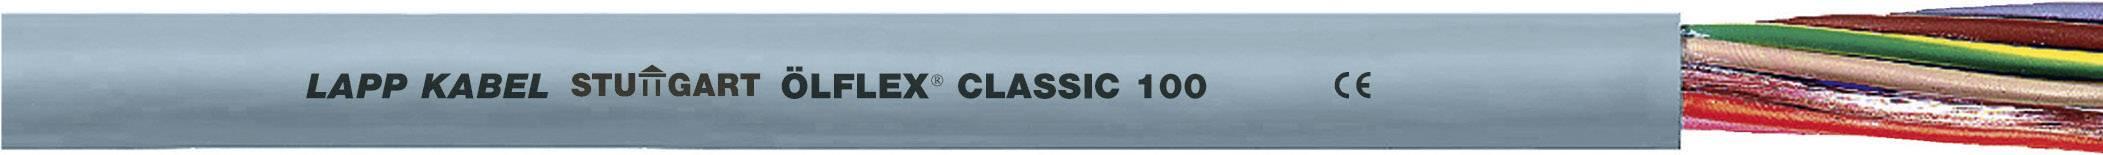 Kabel LappKabel Ölflex CLASSIC 100 5G25 (00101163), PVC, 28,5 mm, 750 V, šedá, 100 m